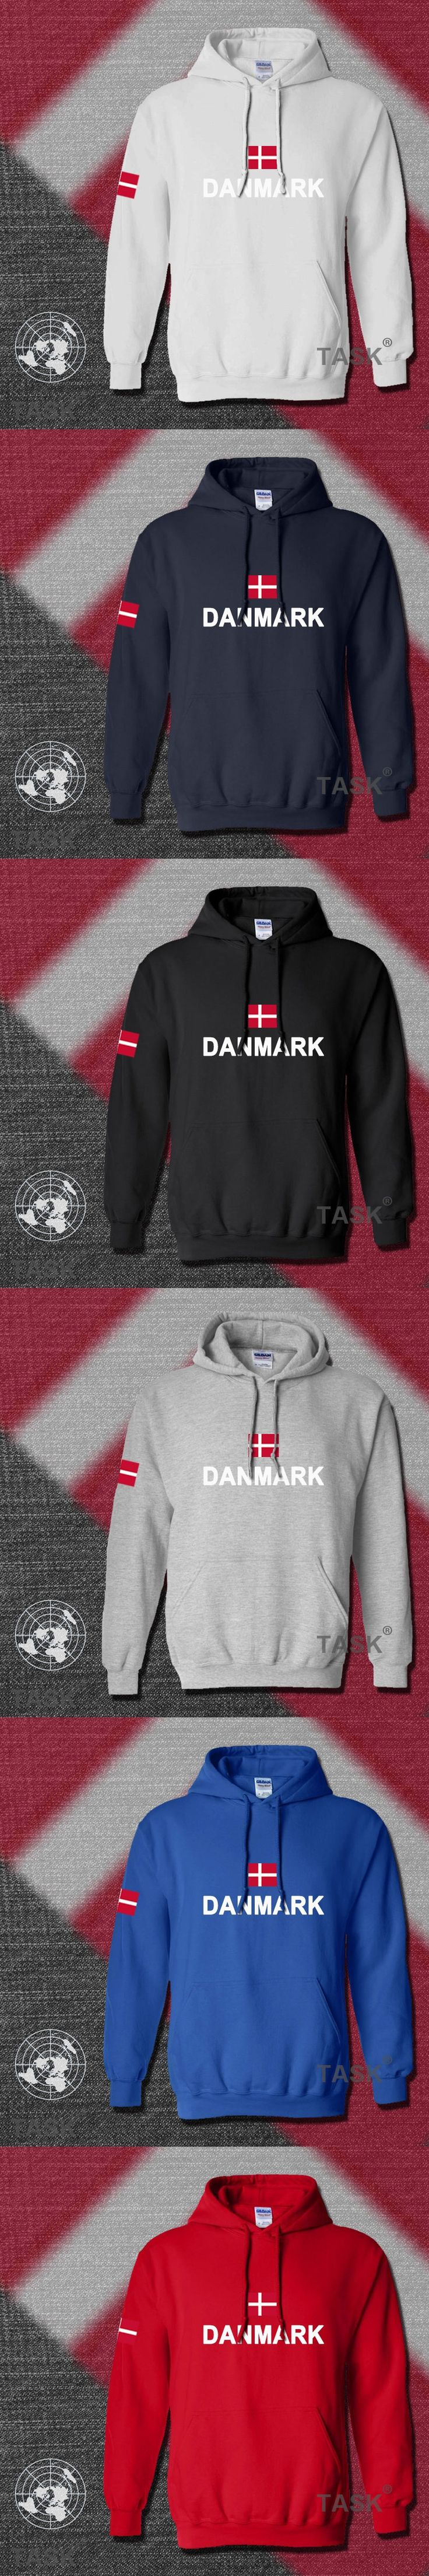 Denmark hoodies men sweatshirt polo sweat new hip hop streetwear footballes jerseyes tracksuit nation Danish flag DK Danmark